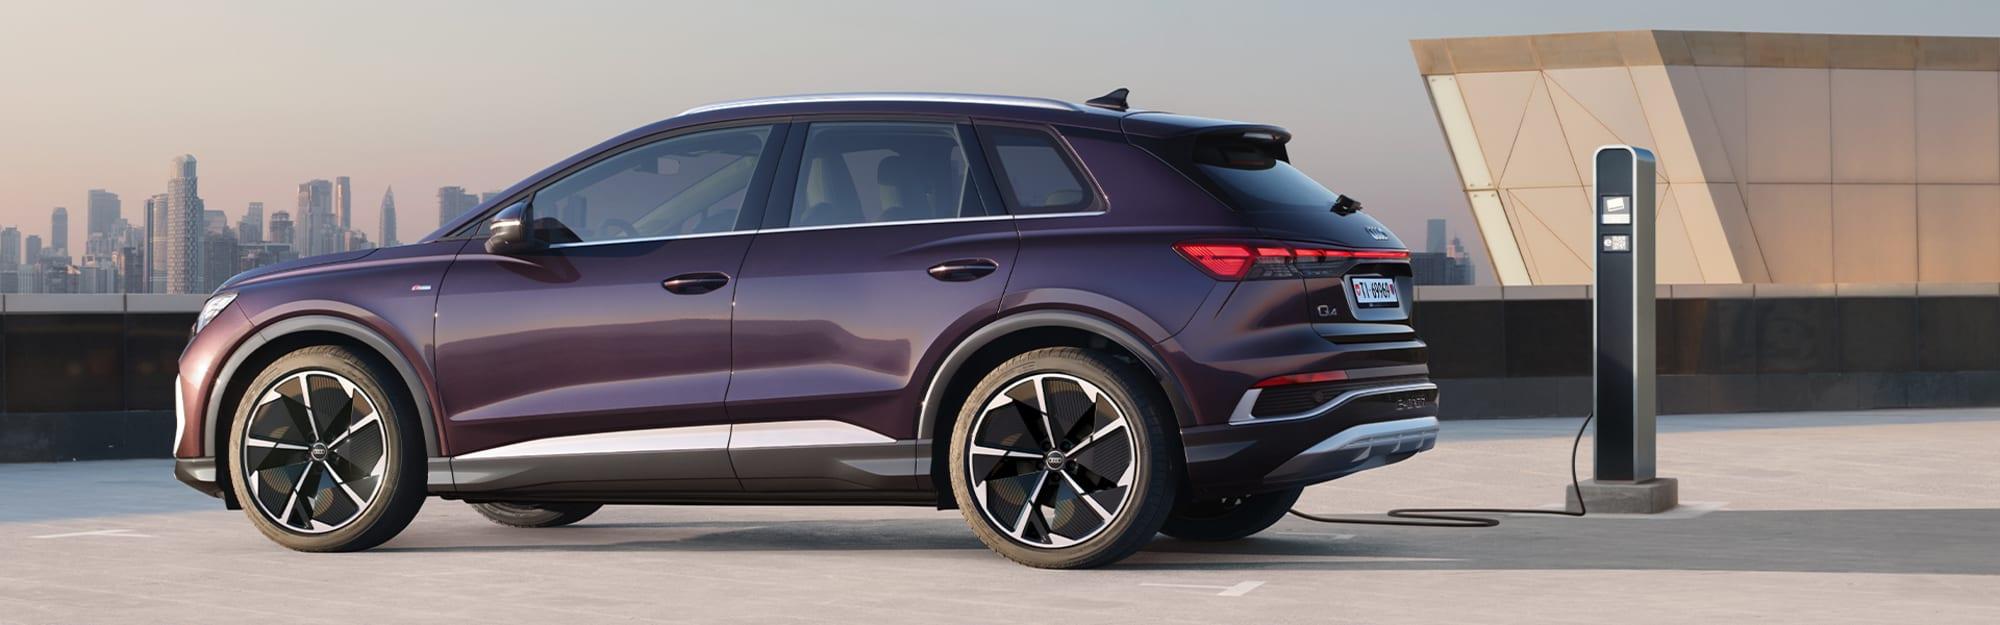 Audi_Q4etron_Haendlerwebseite_1920x600px_i